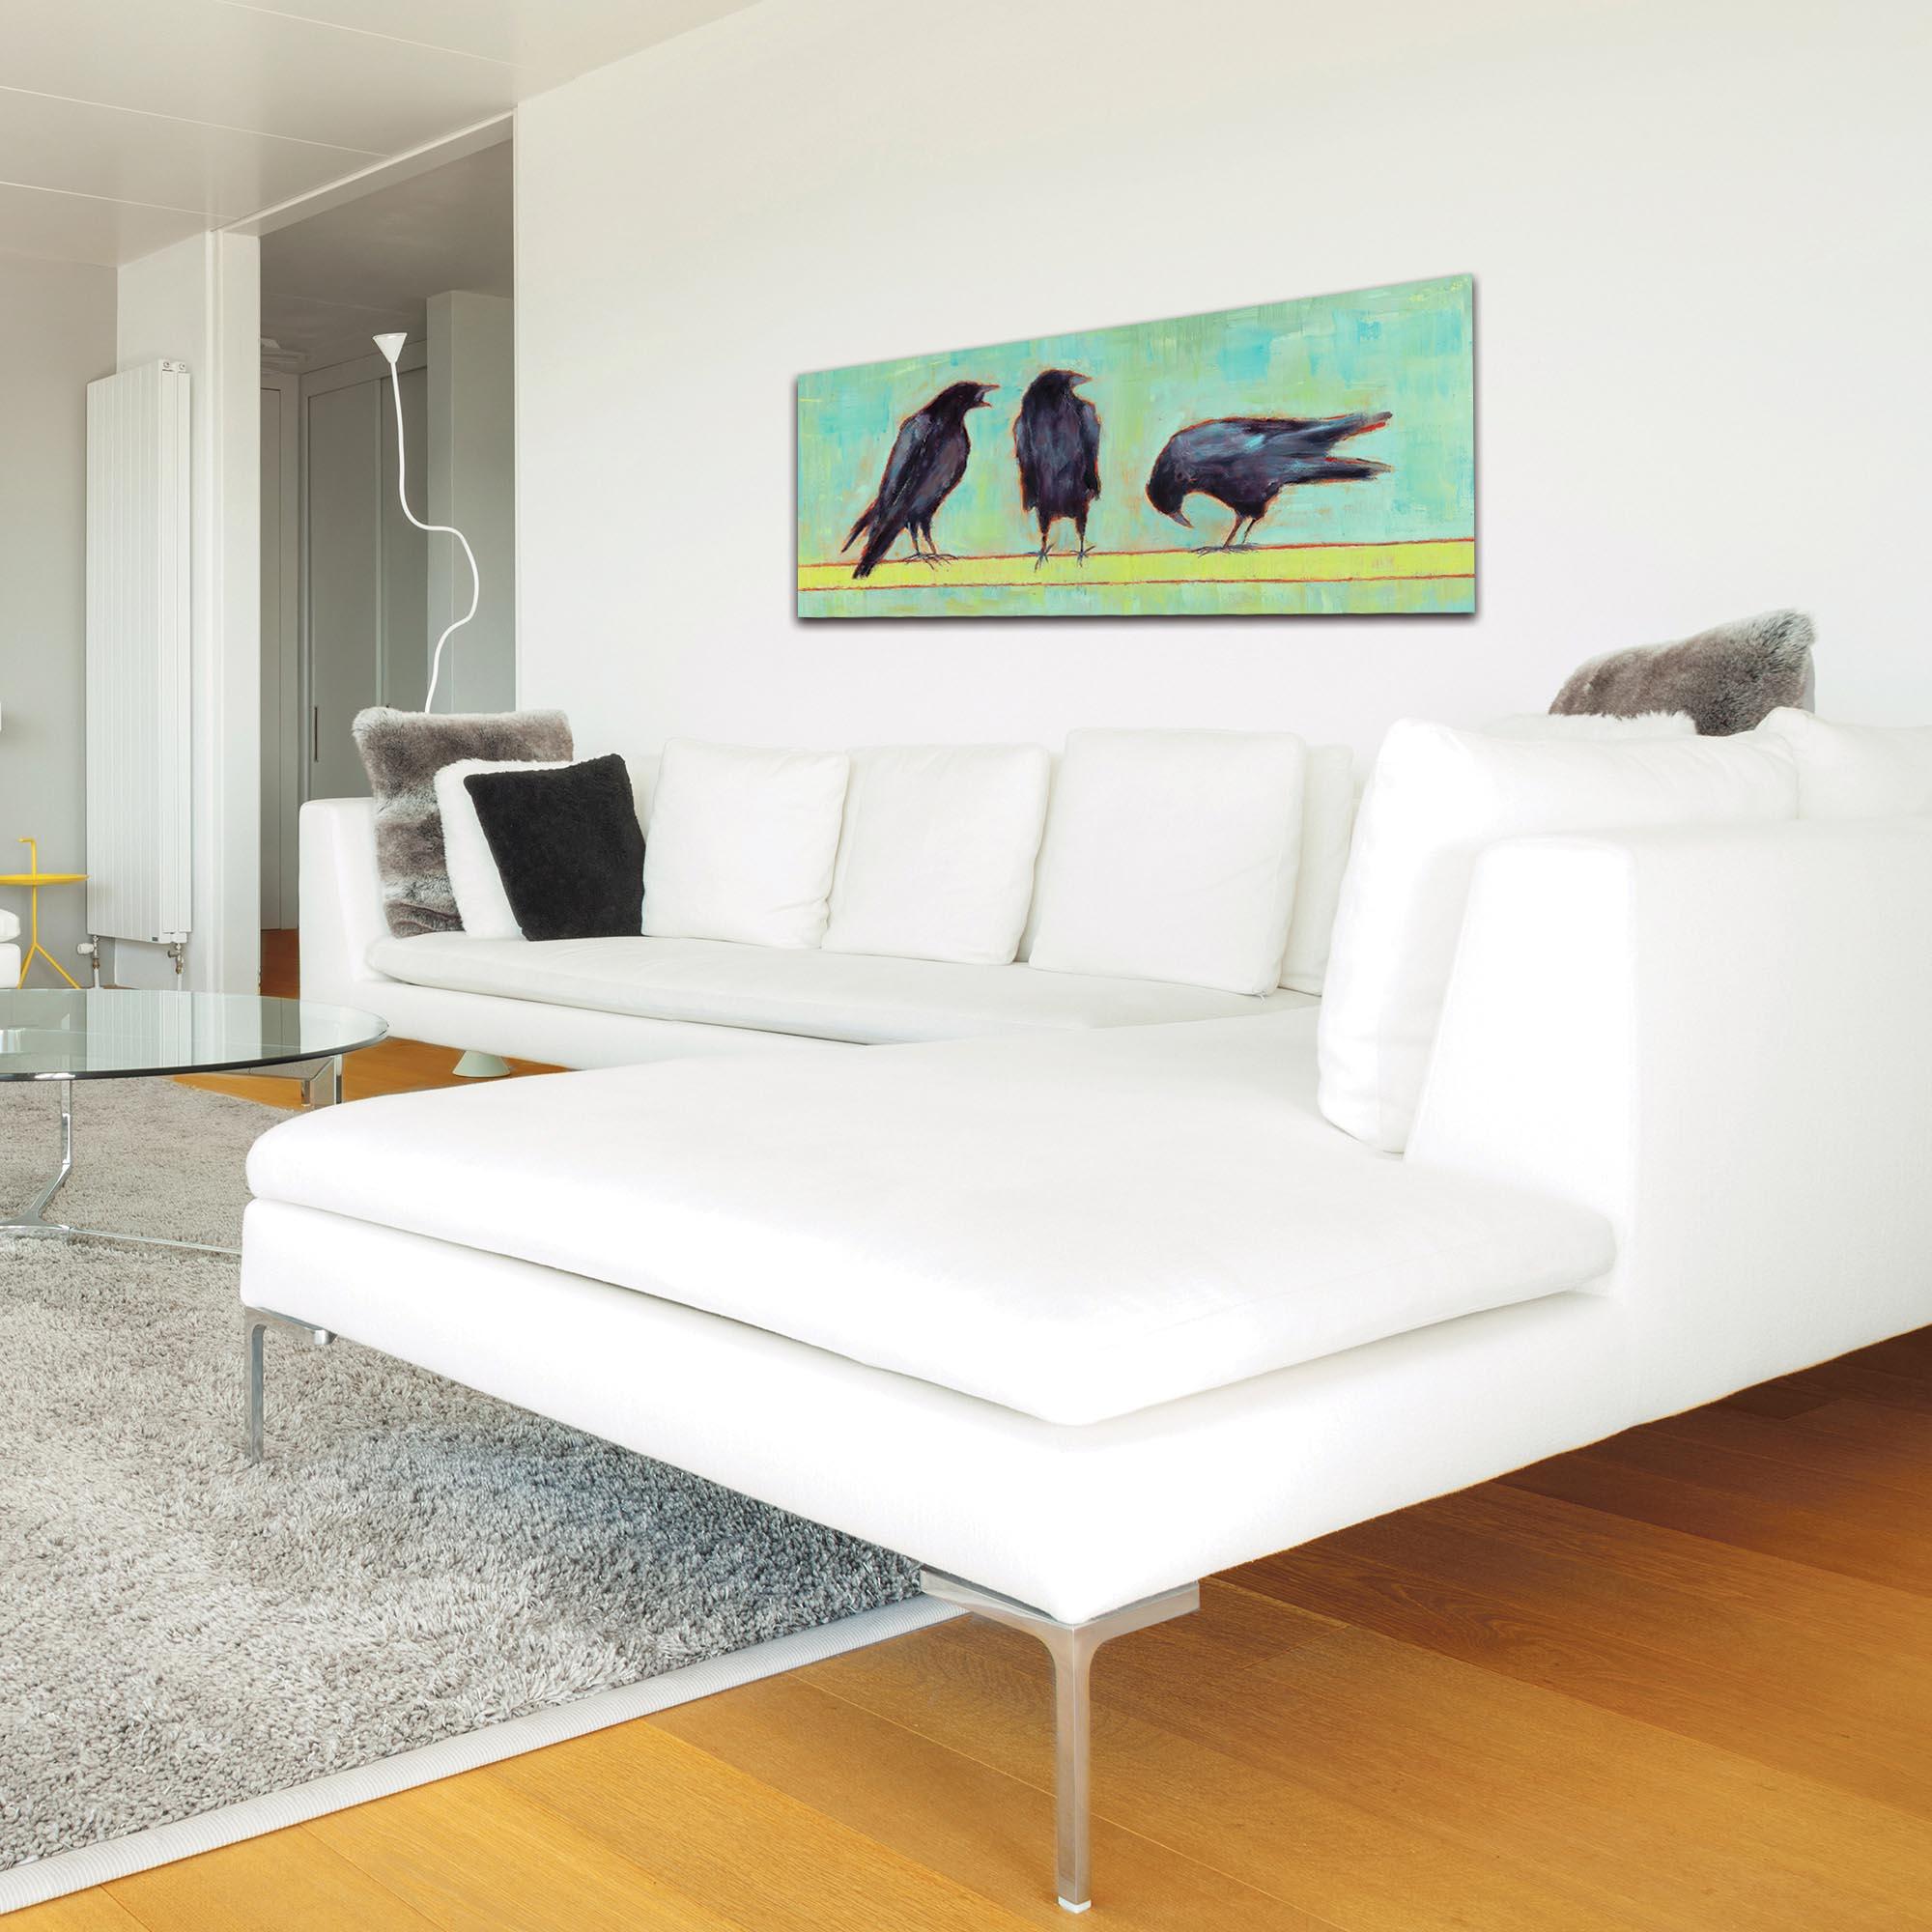 Contemporary Wall Art 'Crow Bar 1 v2' - Urban Birds Decor on Metal or Plexiglass - Lifestyle View